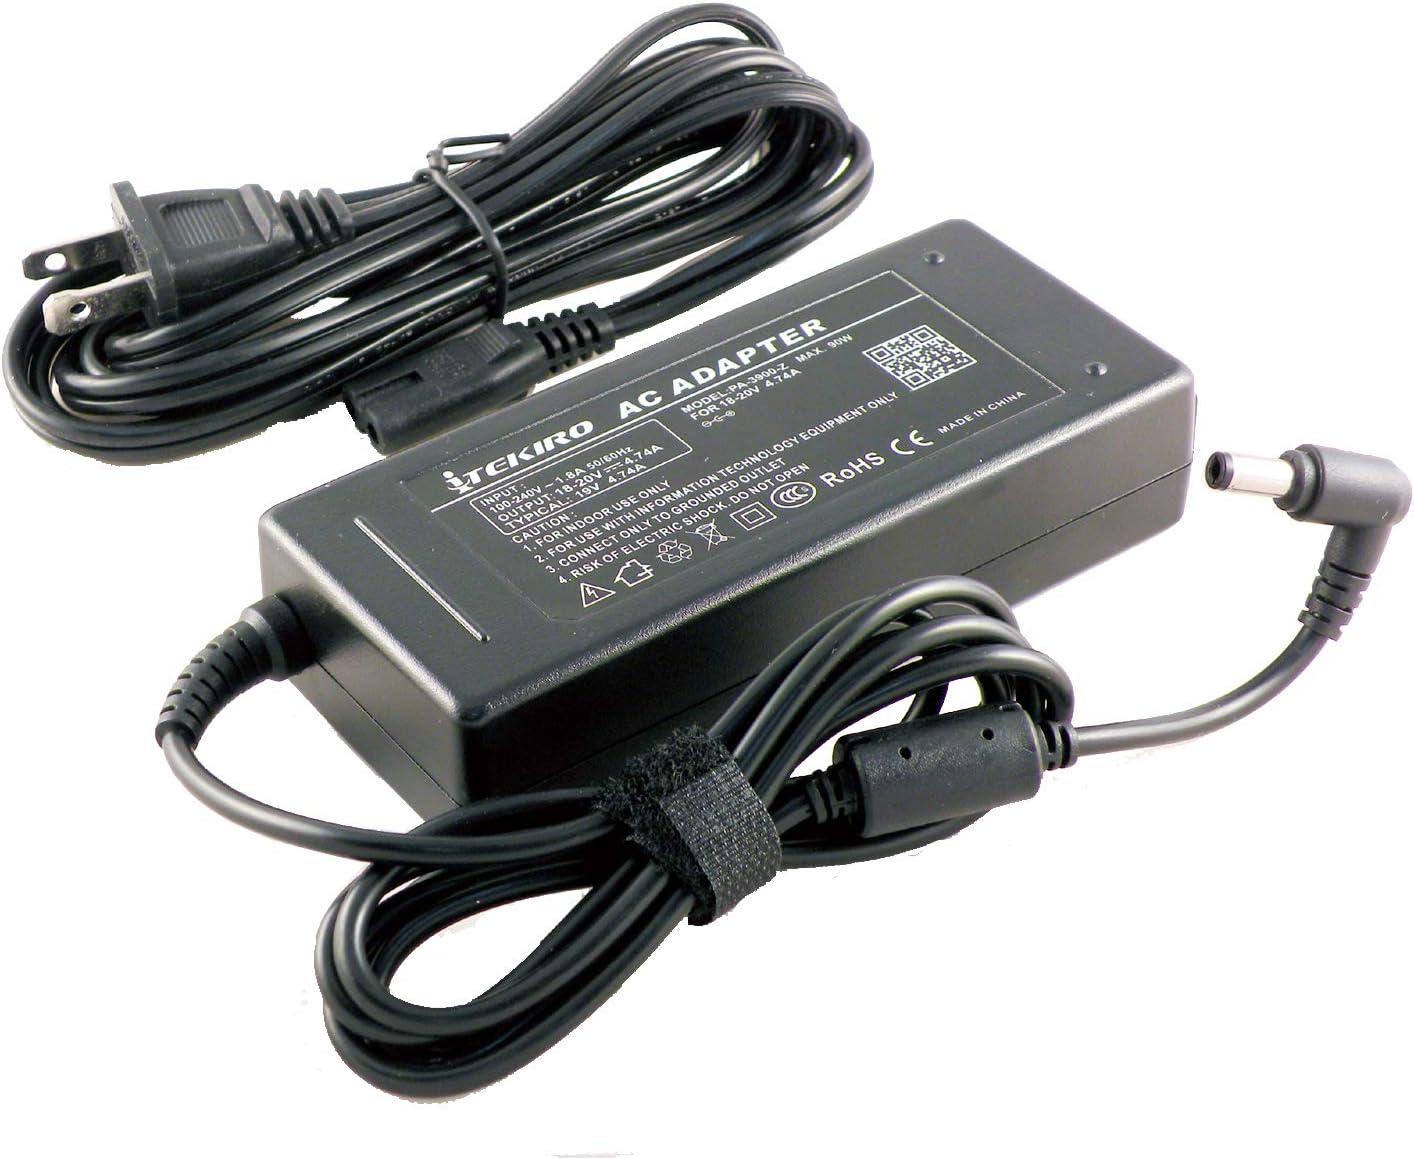 iTEKIRO AC Adapter Charger for Fujitsu Lifebook T904, T935, T936, T937, T938, T939, U727, U728, U729, U729X, U745, U747, U748